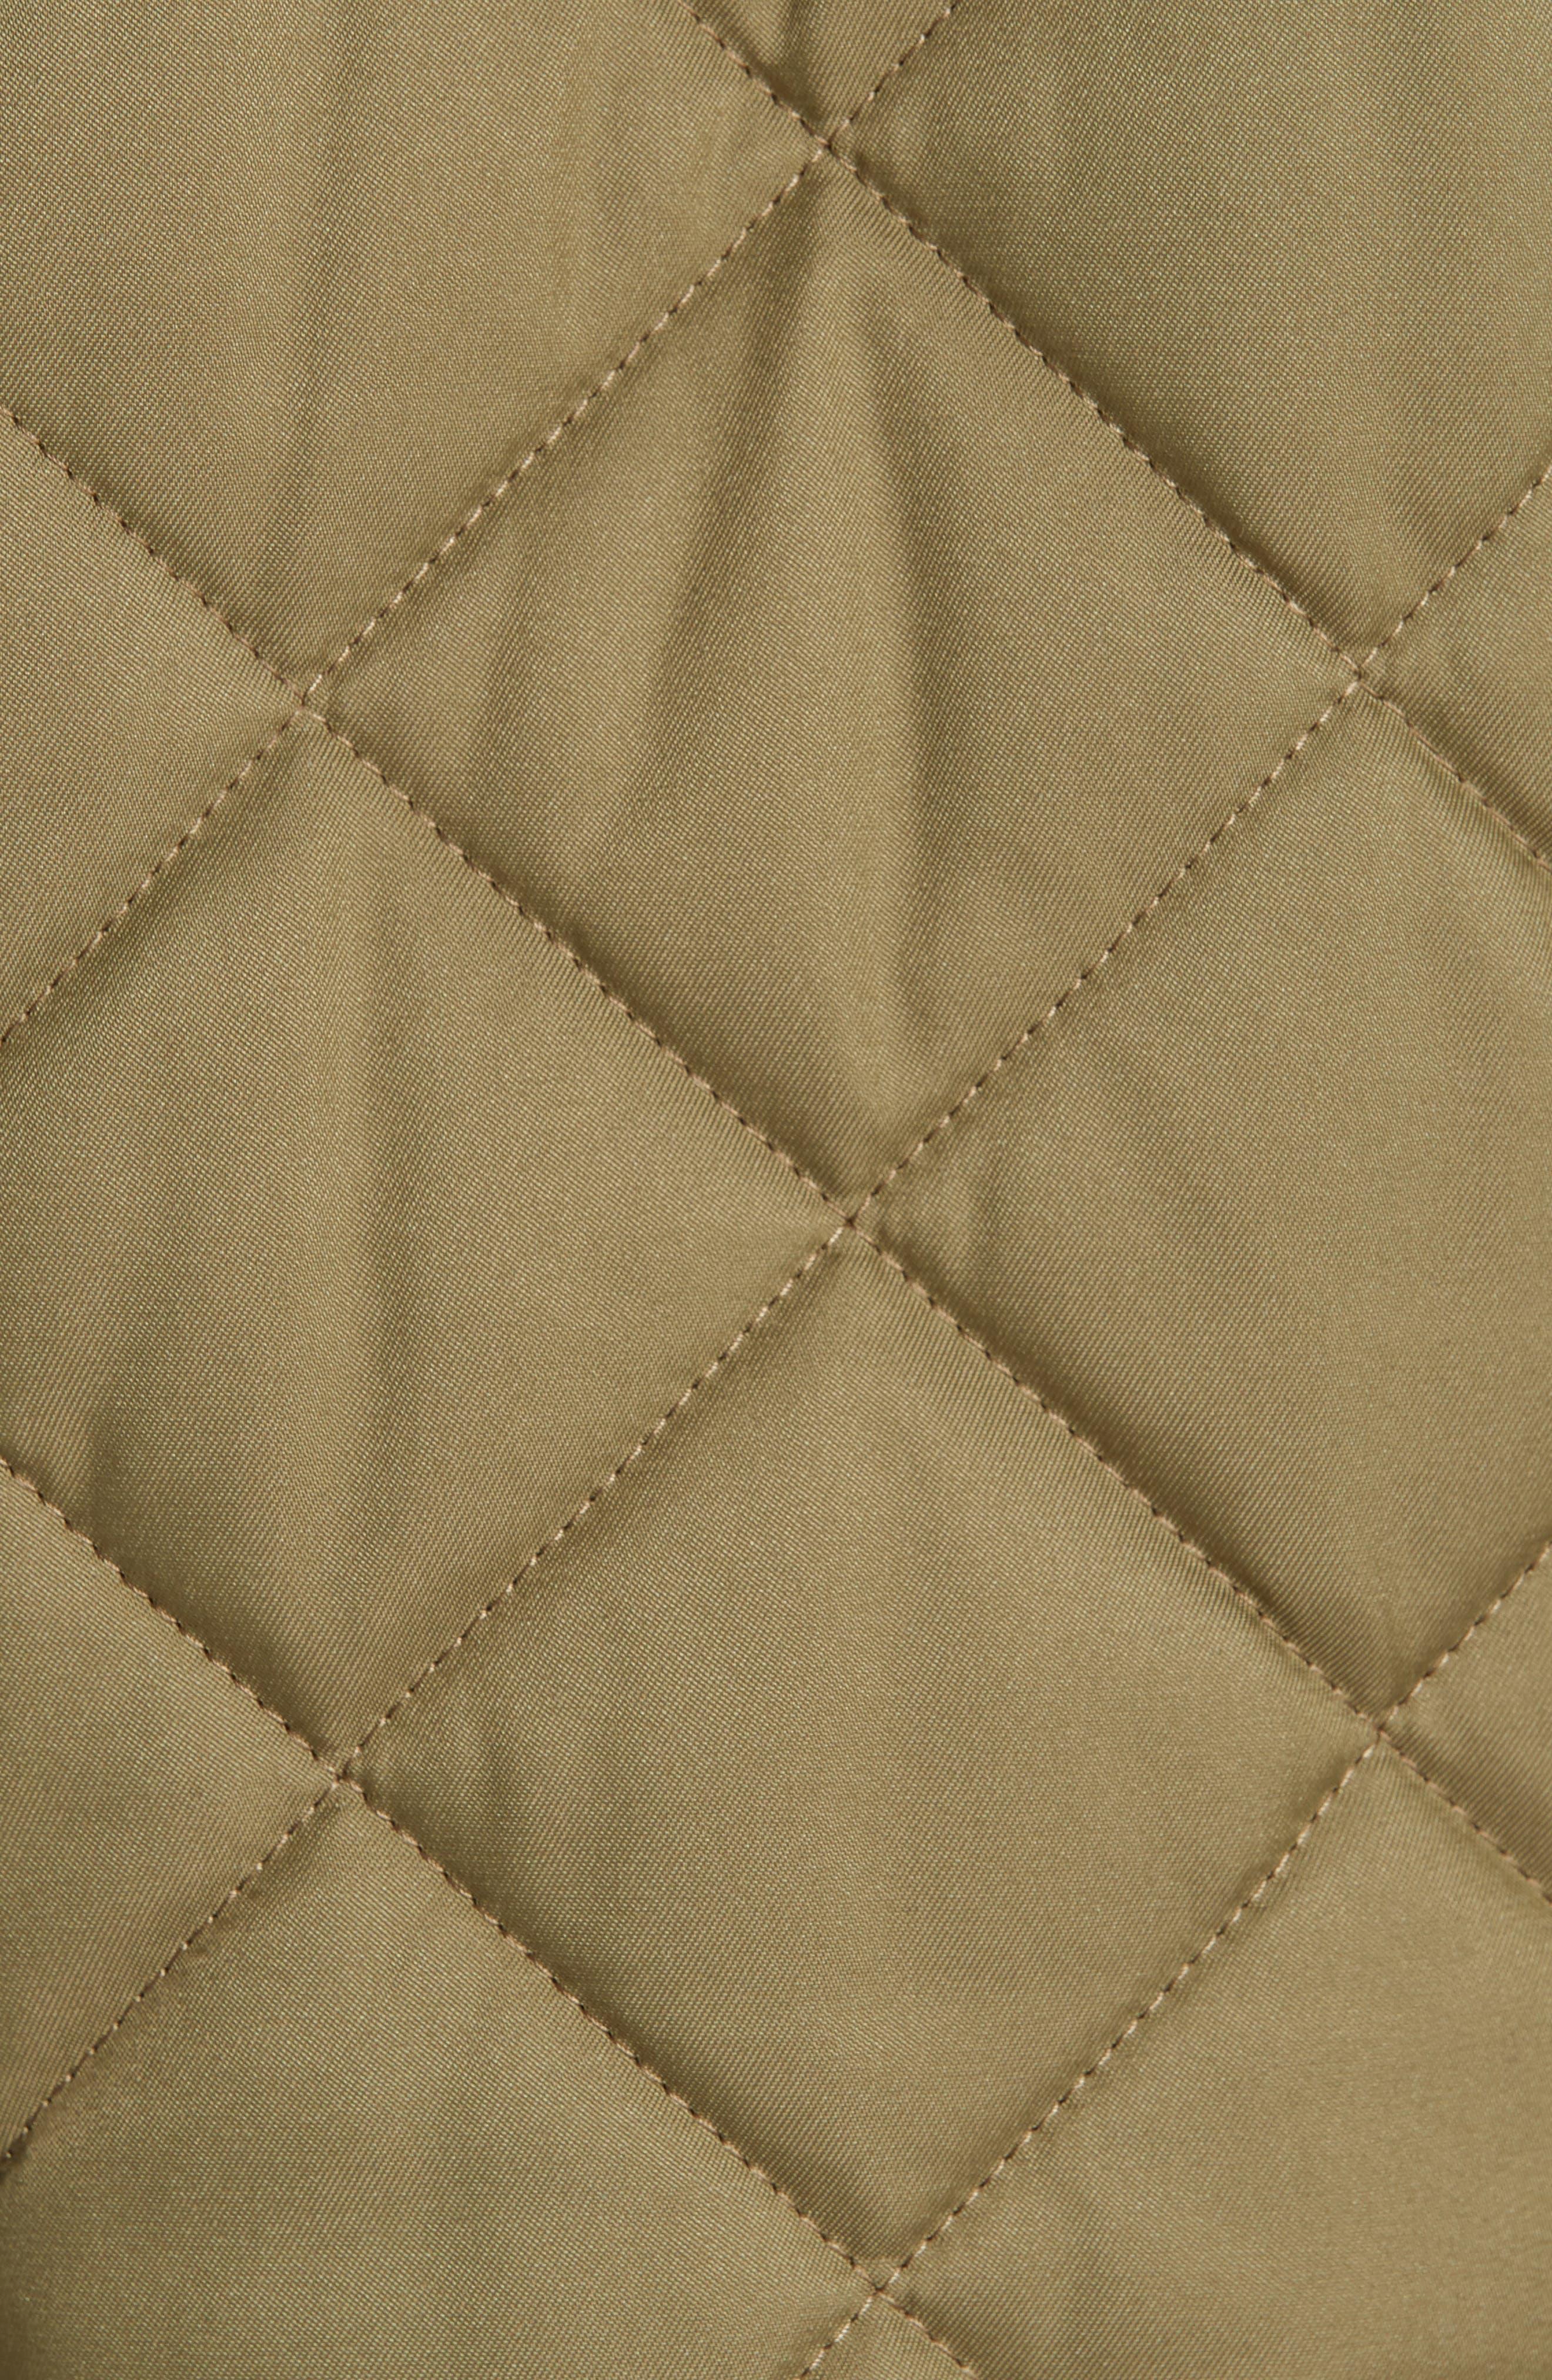 BURBERRY, Franwell Diamond Quilted Jacket, Alternate thumbnail 6, color, LIGHT KHAKI